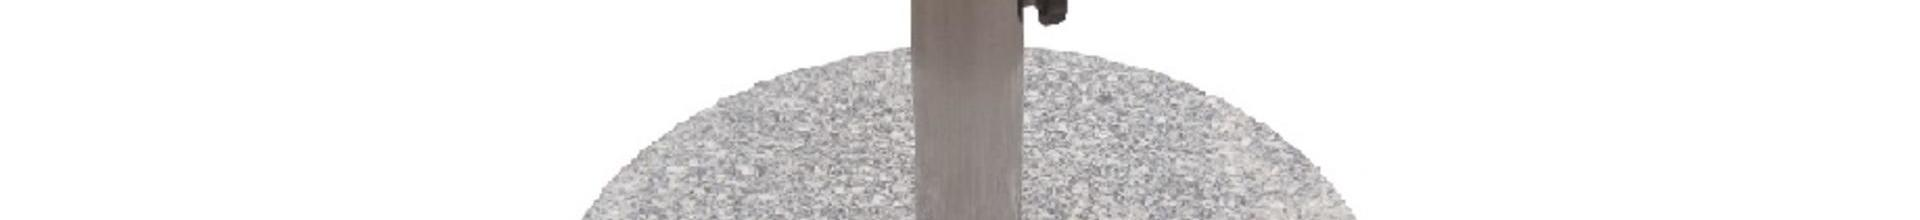 17kg Granite Parasol Base